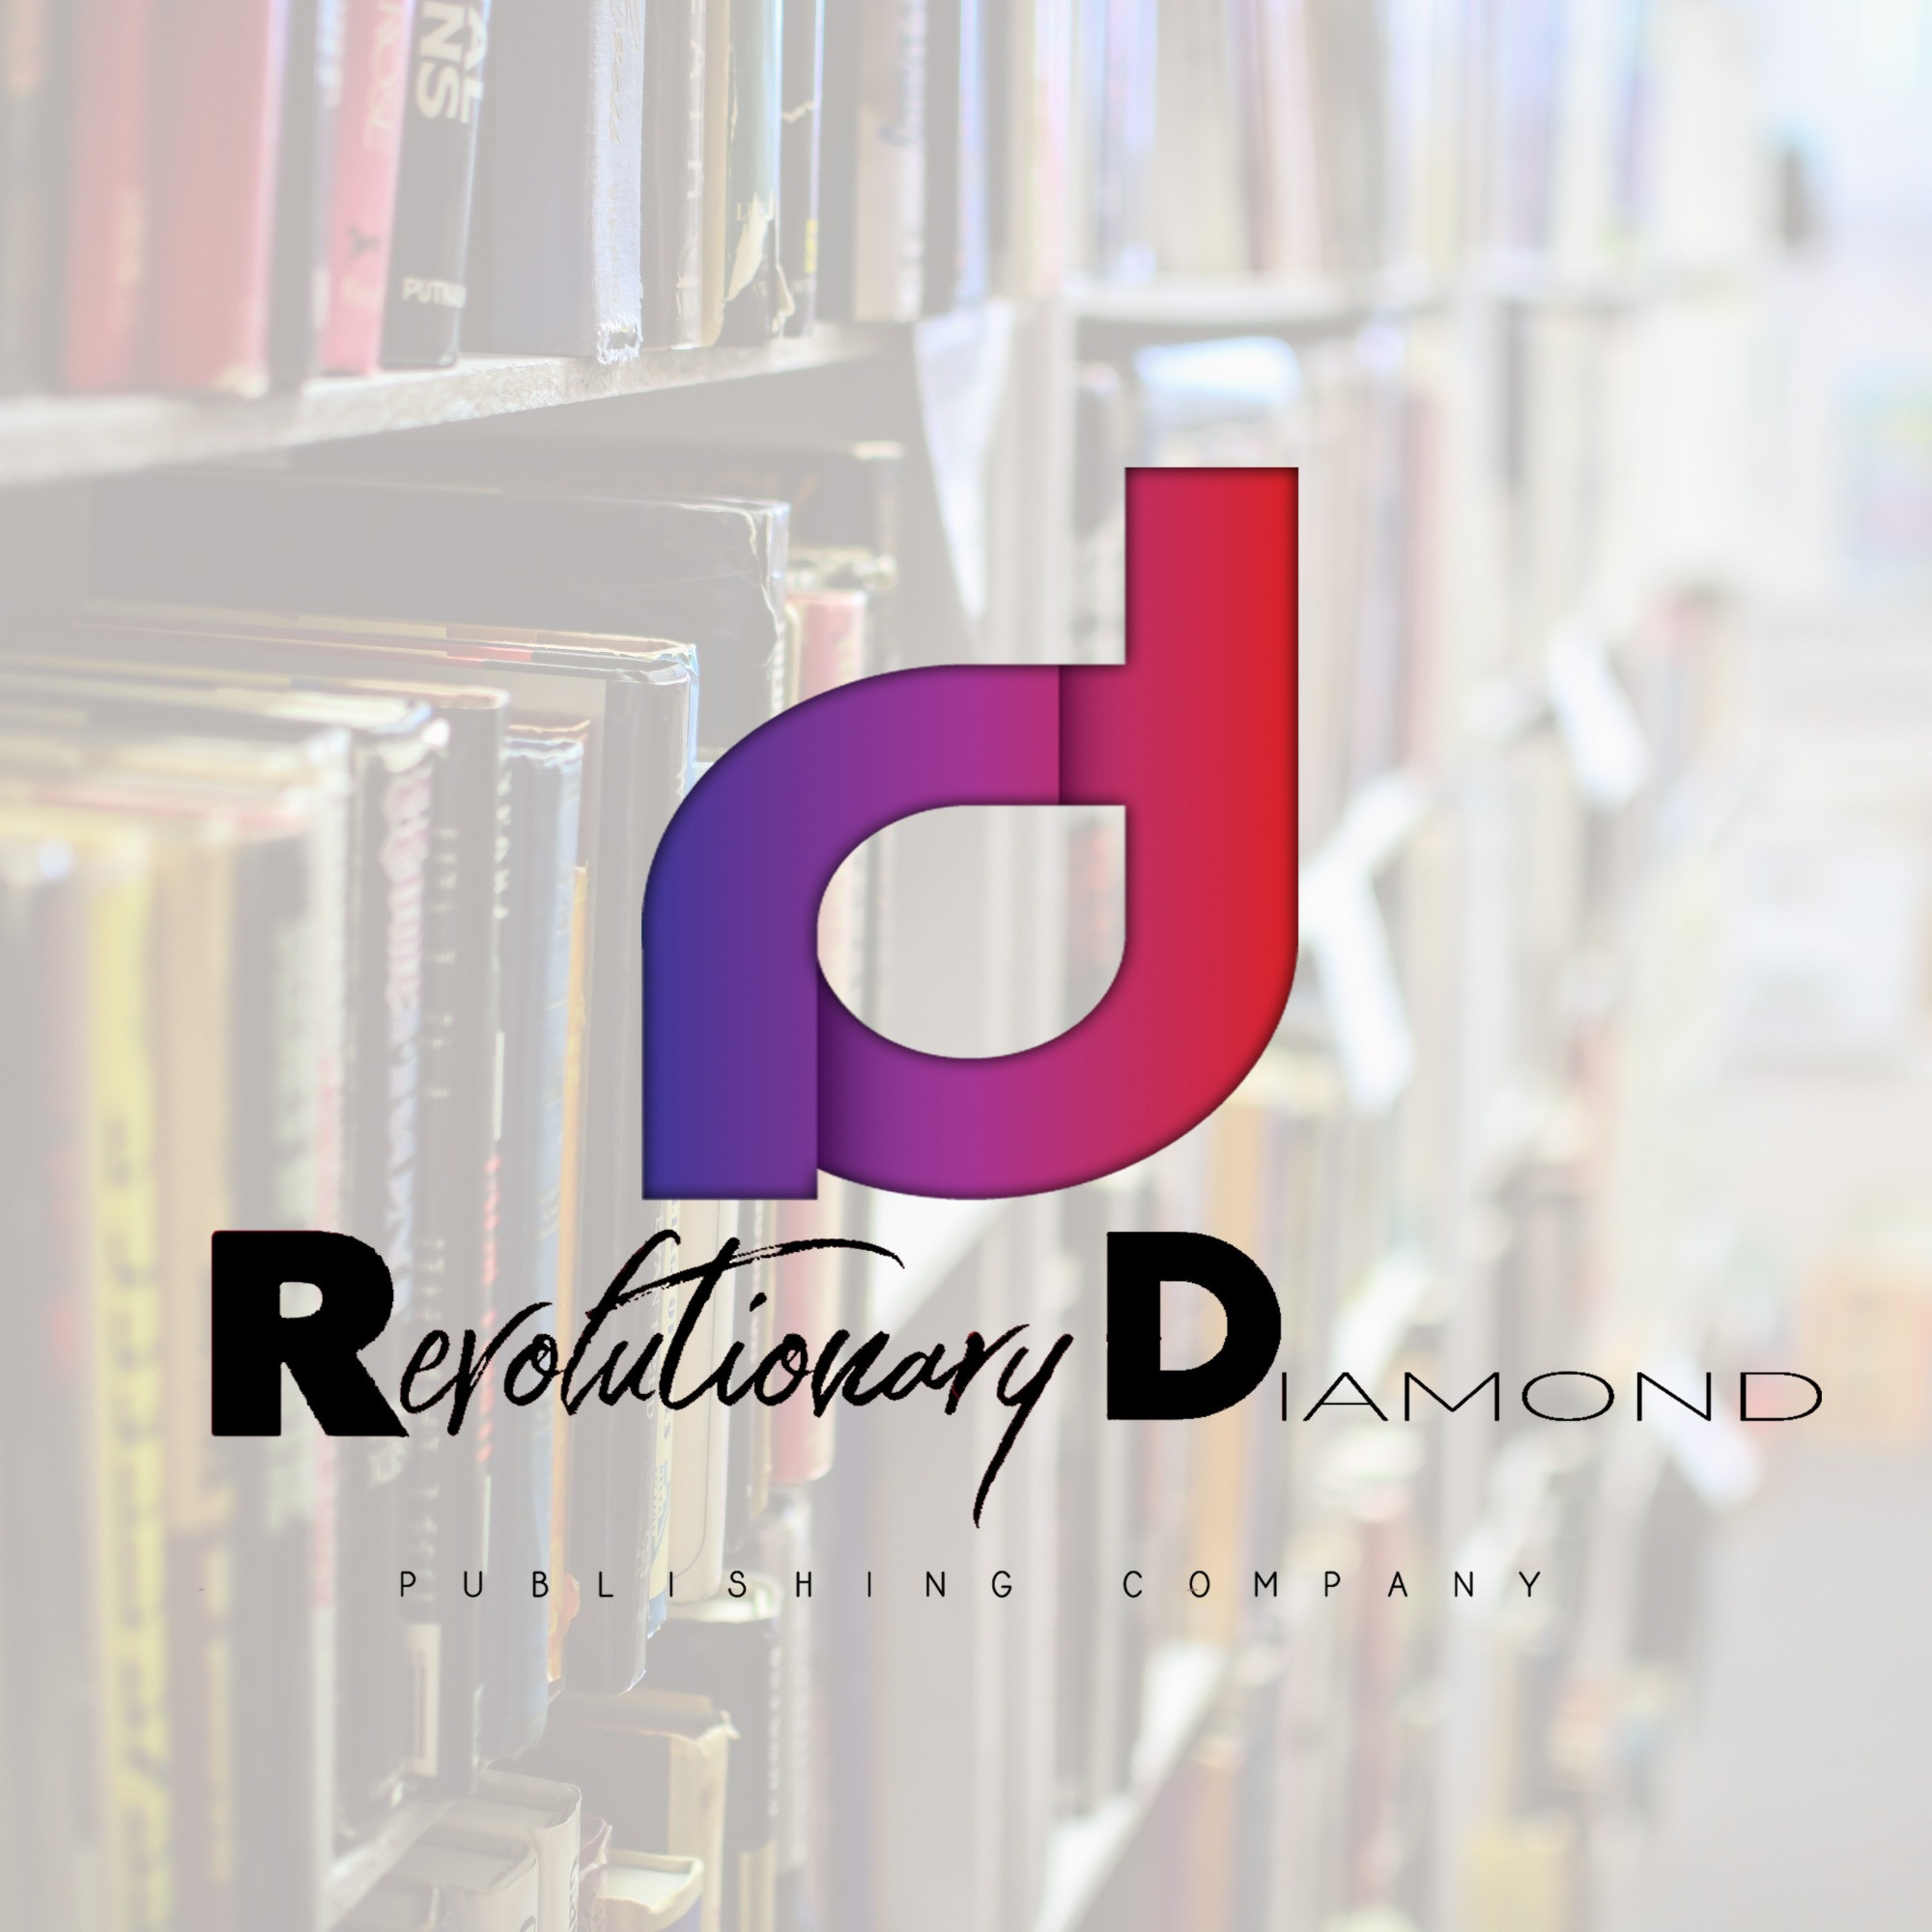 Publishing - Initial Consultation